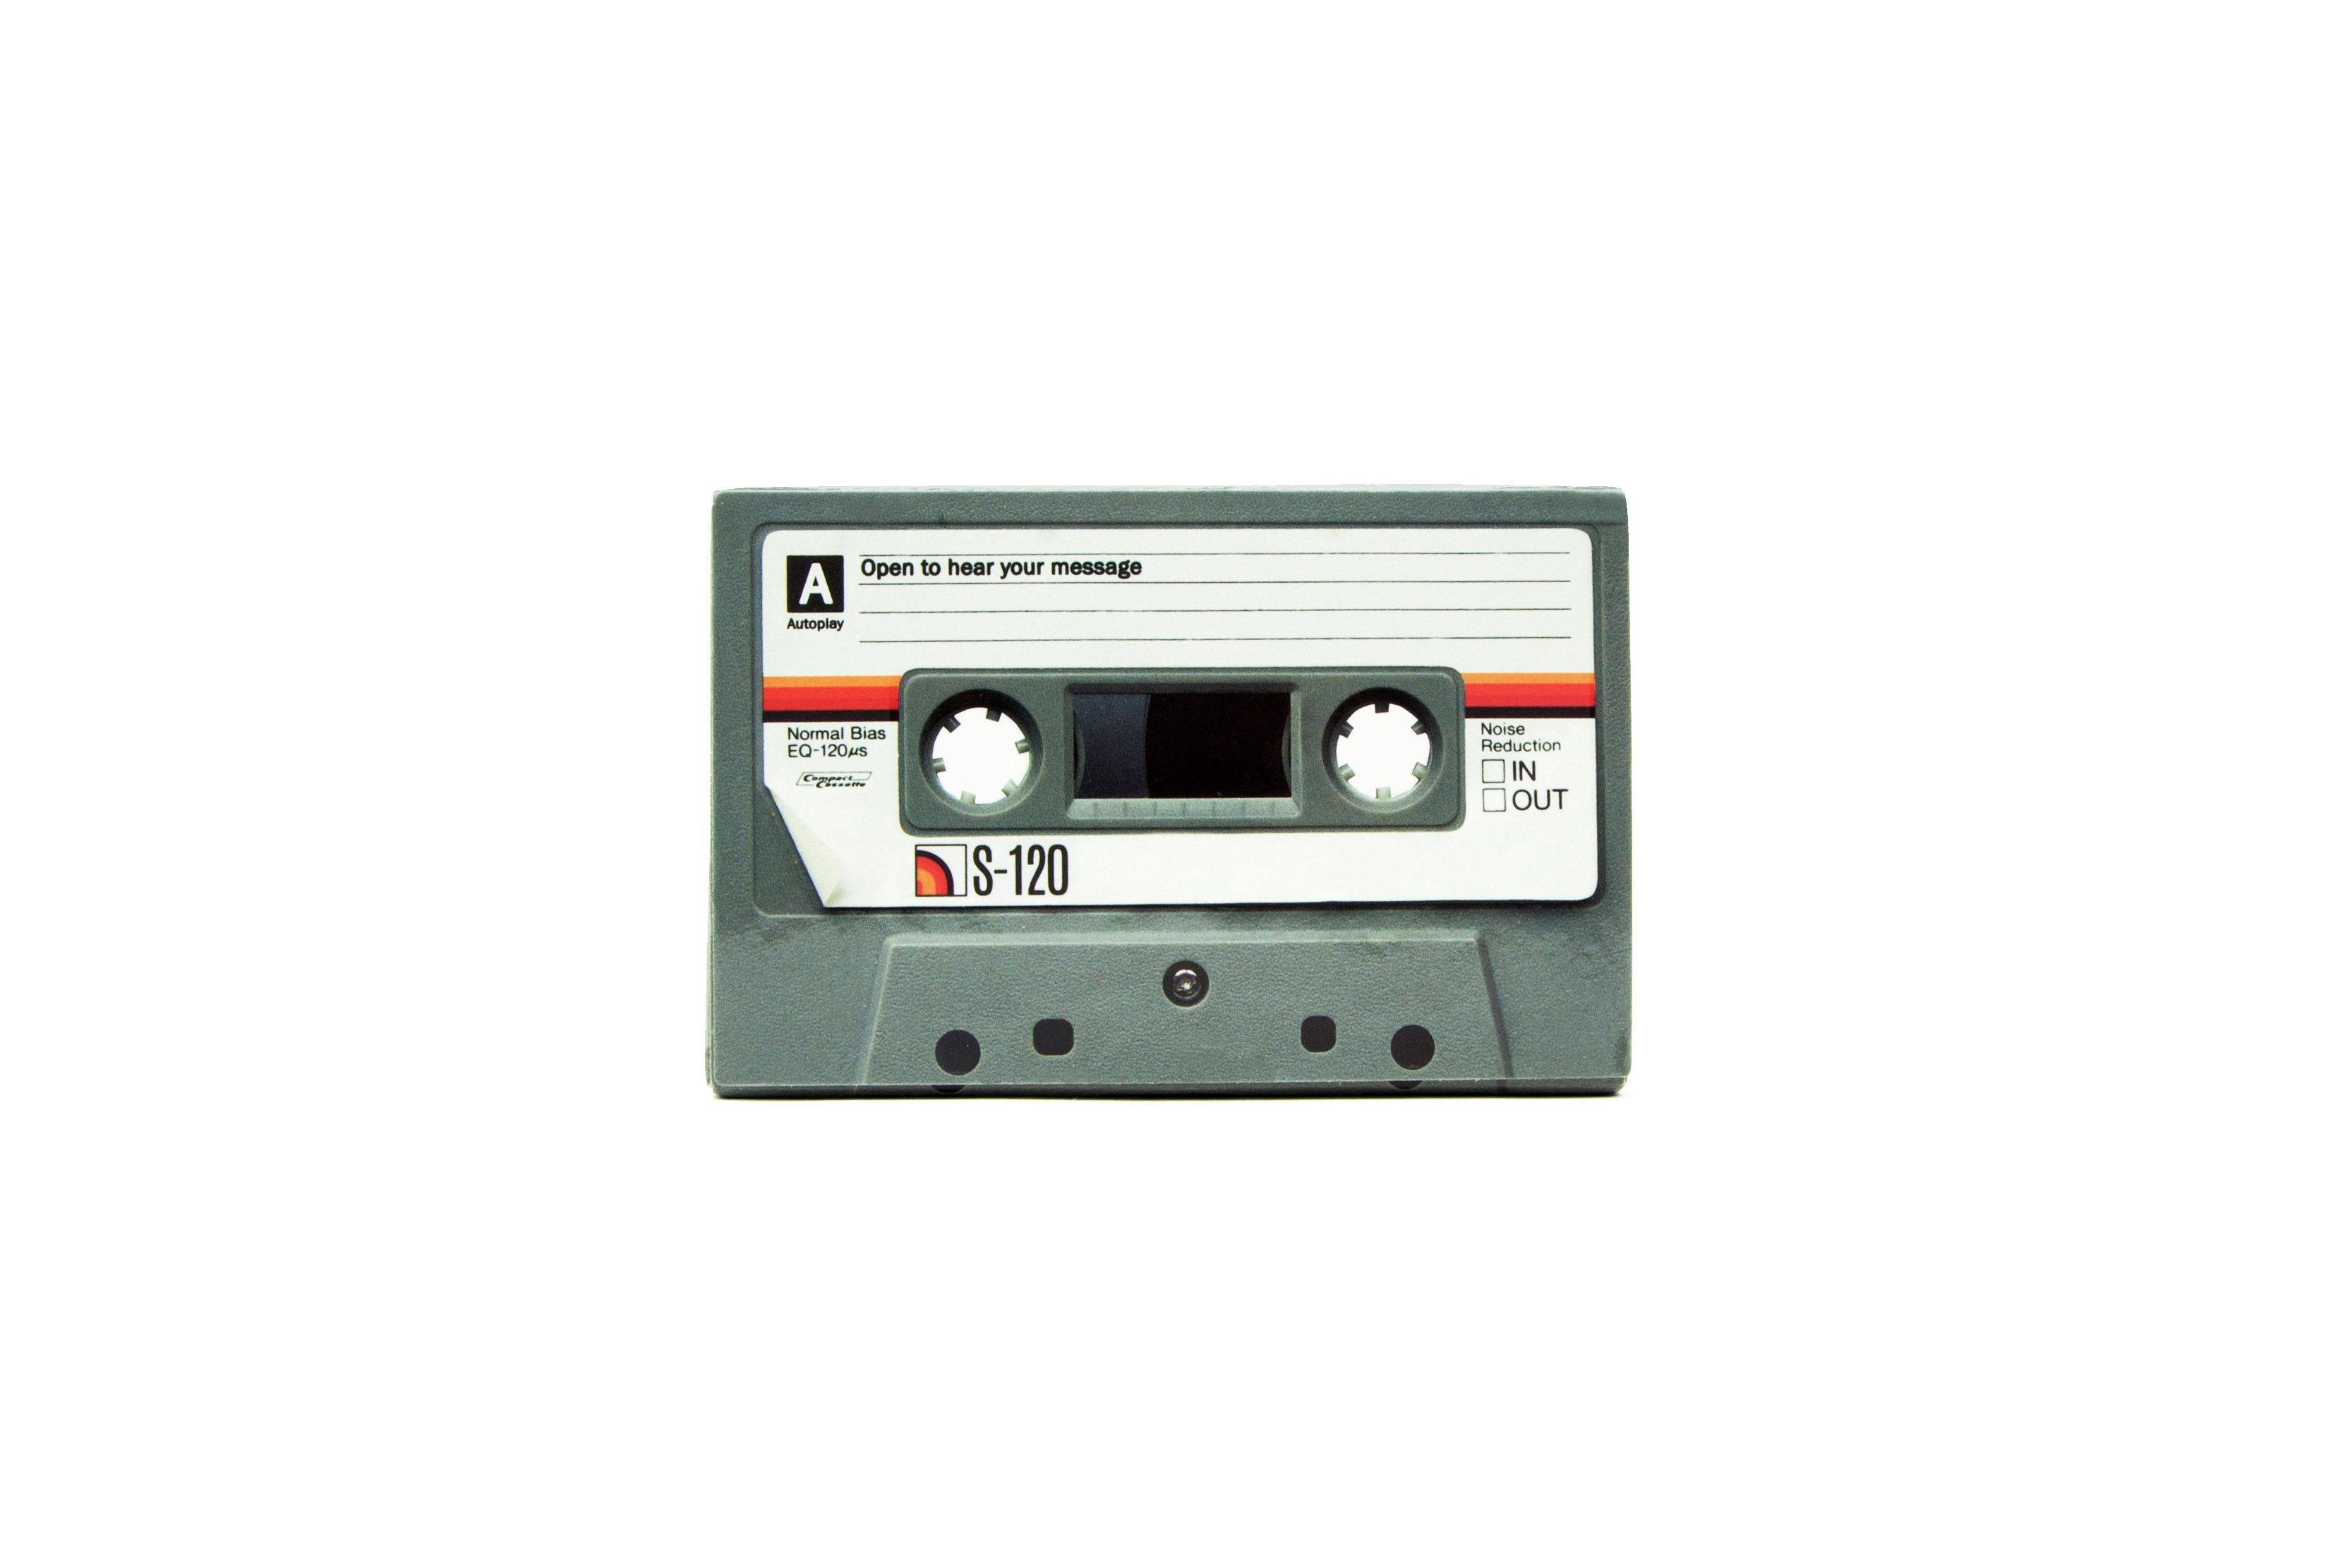 Volume Large Audio Docks & Mini Speakers Trend Mark Suck Uk Card Radio Free Shipping Portable Audio & Headphones